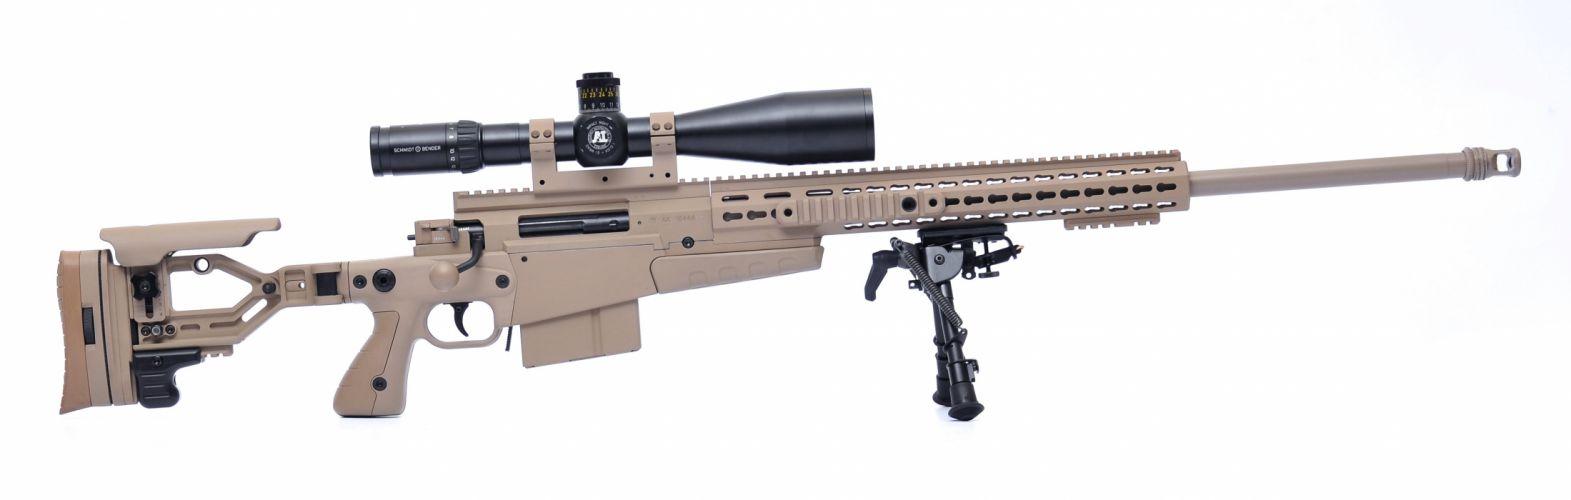 ACCURACY INTERNATIONAL sniper rifle weapon gun police military (7) wallpaper